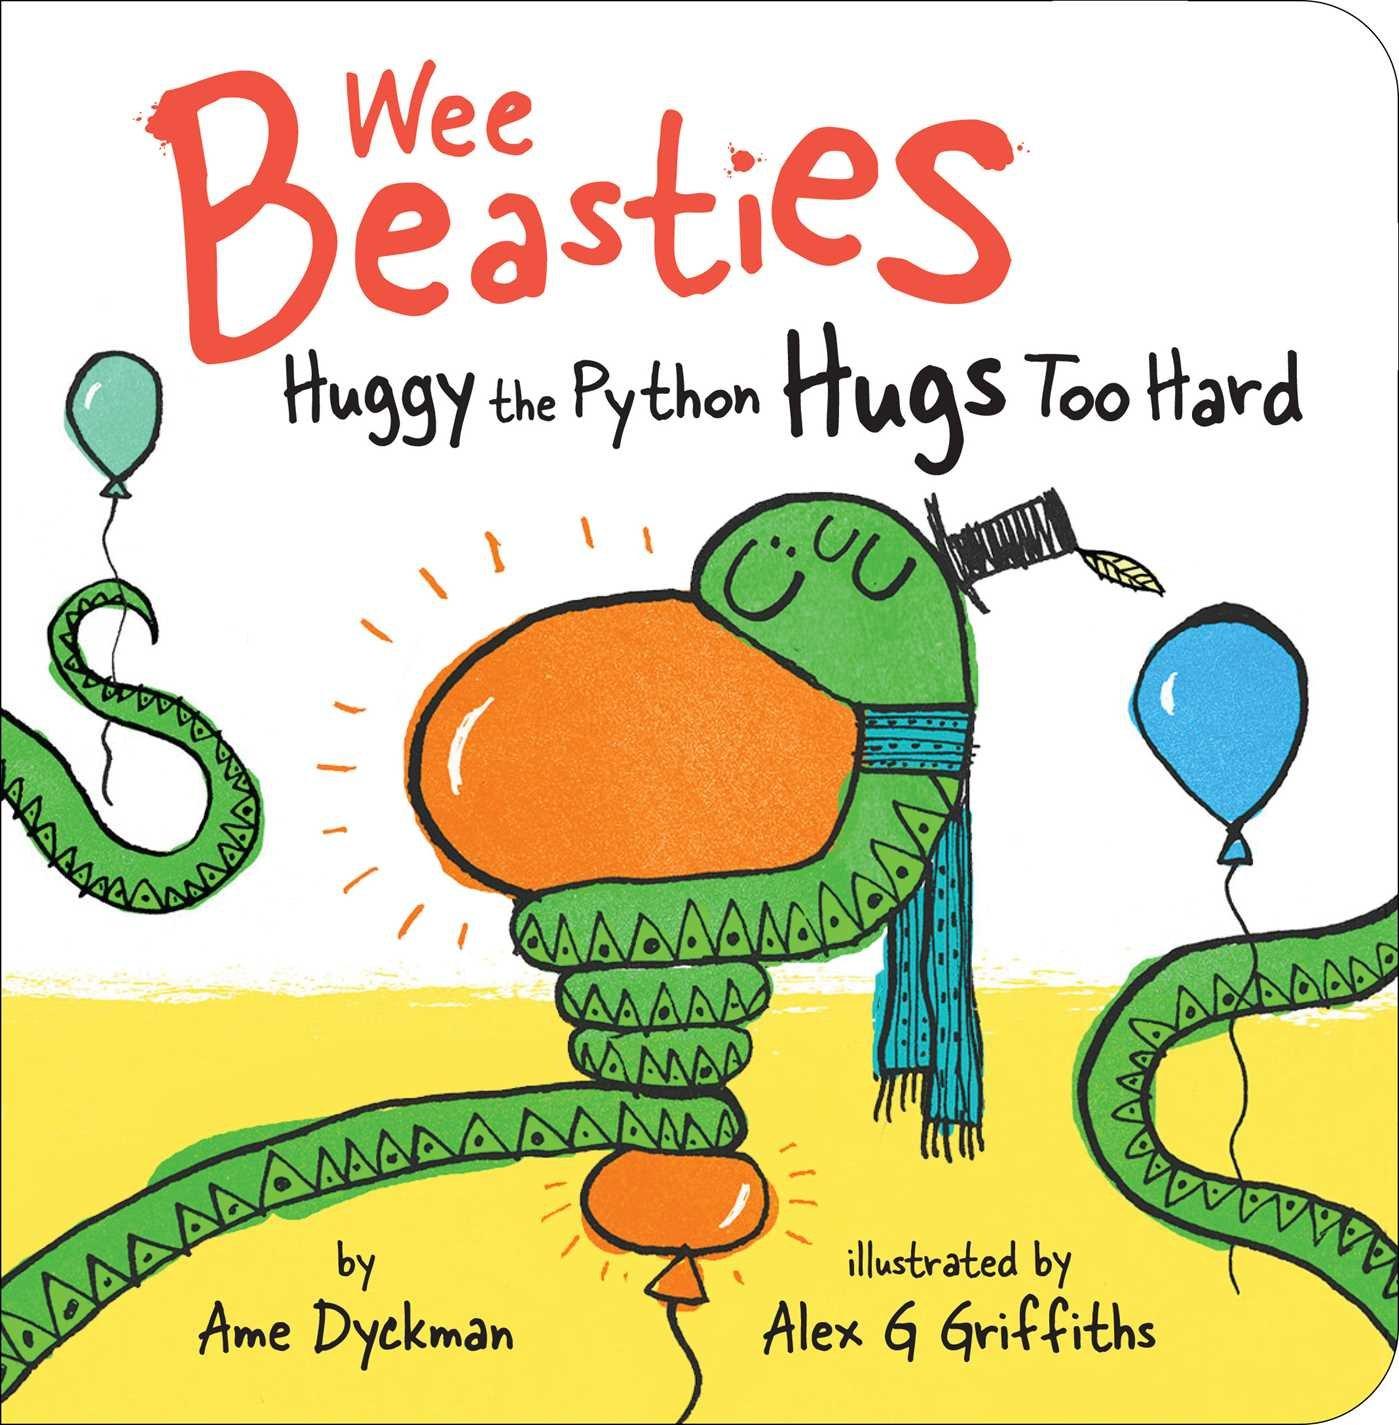 Huggy the Python Hugs Too Hard (Wee Beasties): Dyckman, Ame, Griffiths,  Alex G: 9781534410800: Amazon.com: Books